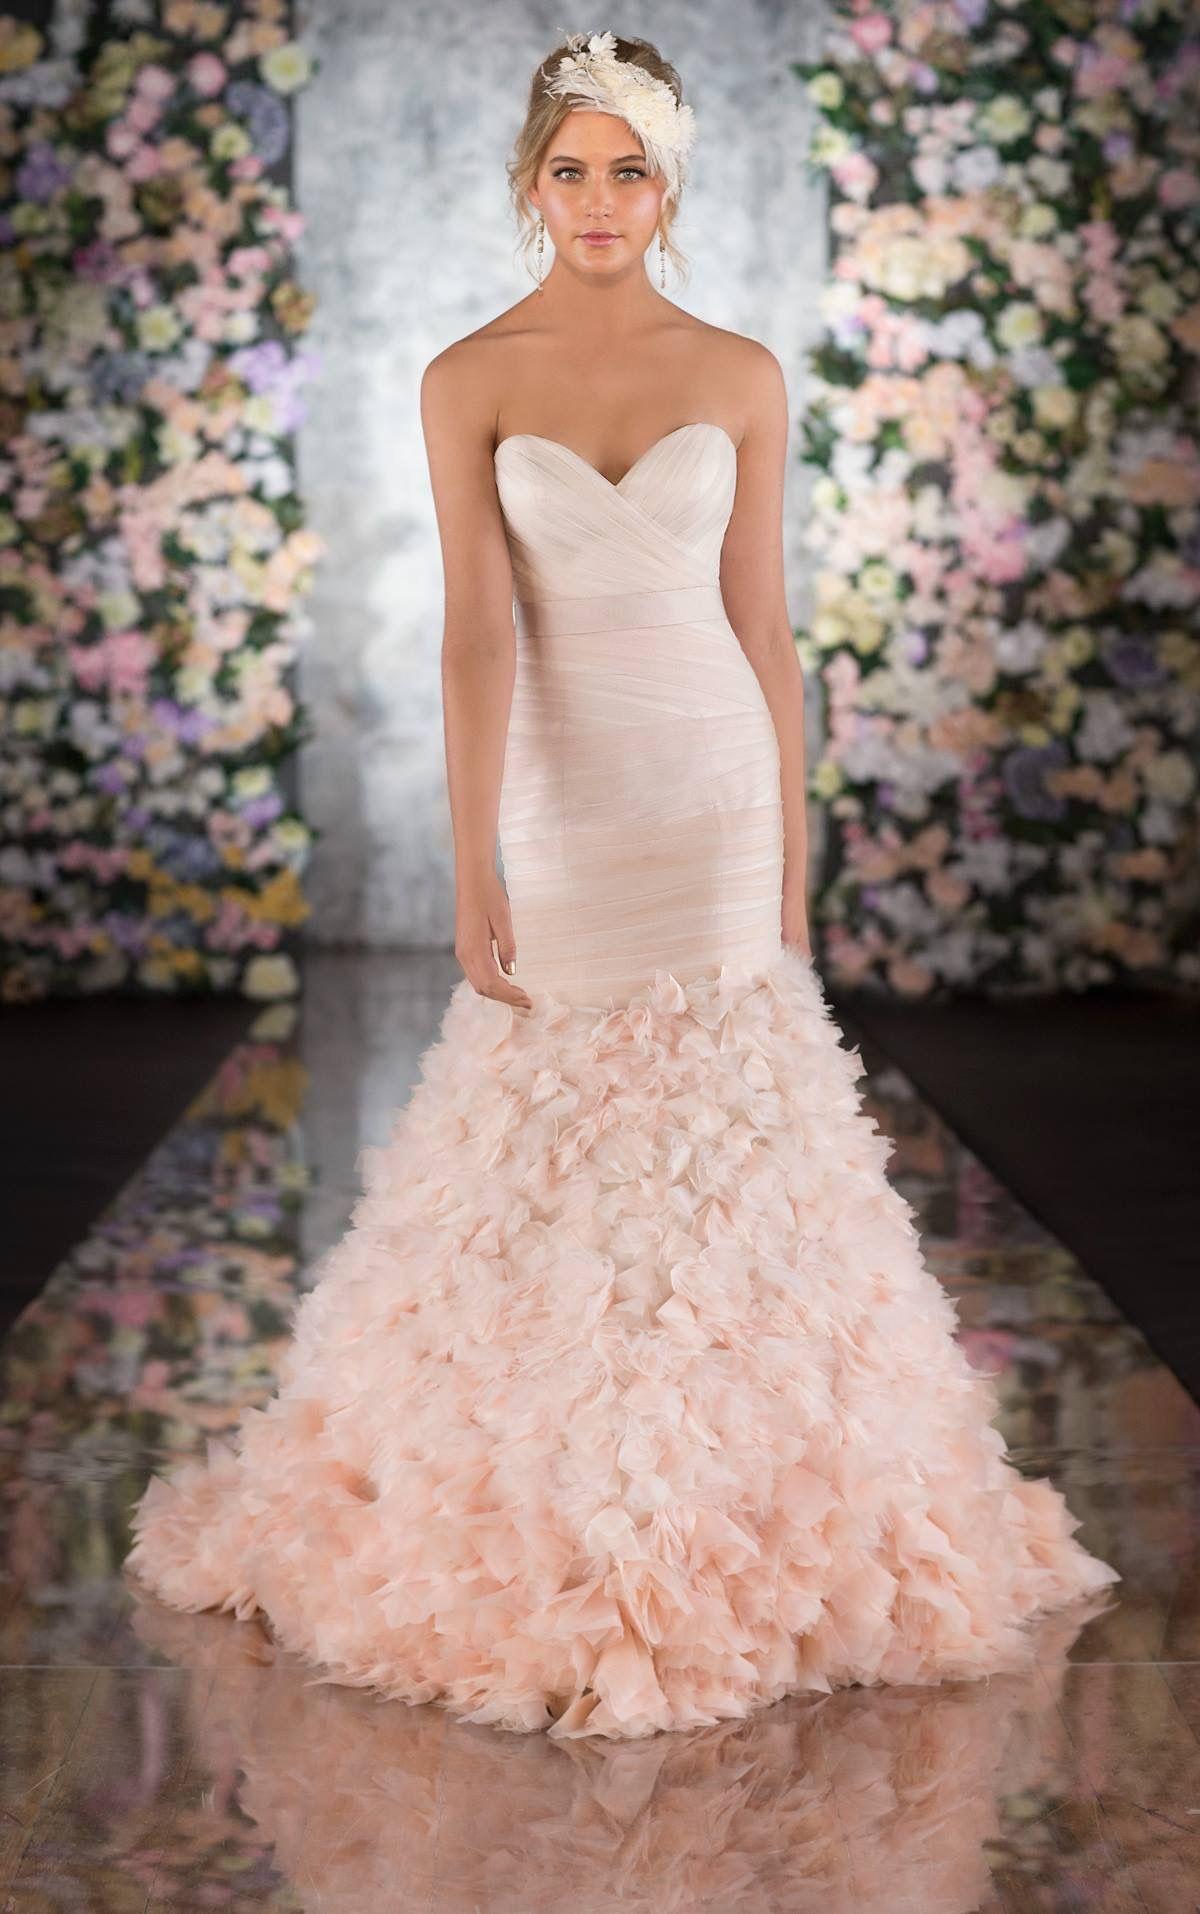 Vestido novia | Vestidos Boda | Pinterest | Vestidos boda, Novios y Boda